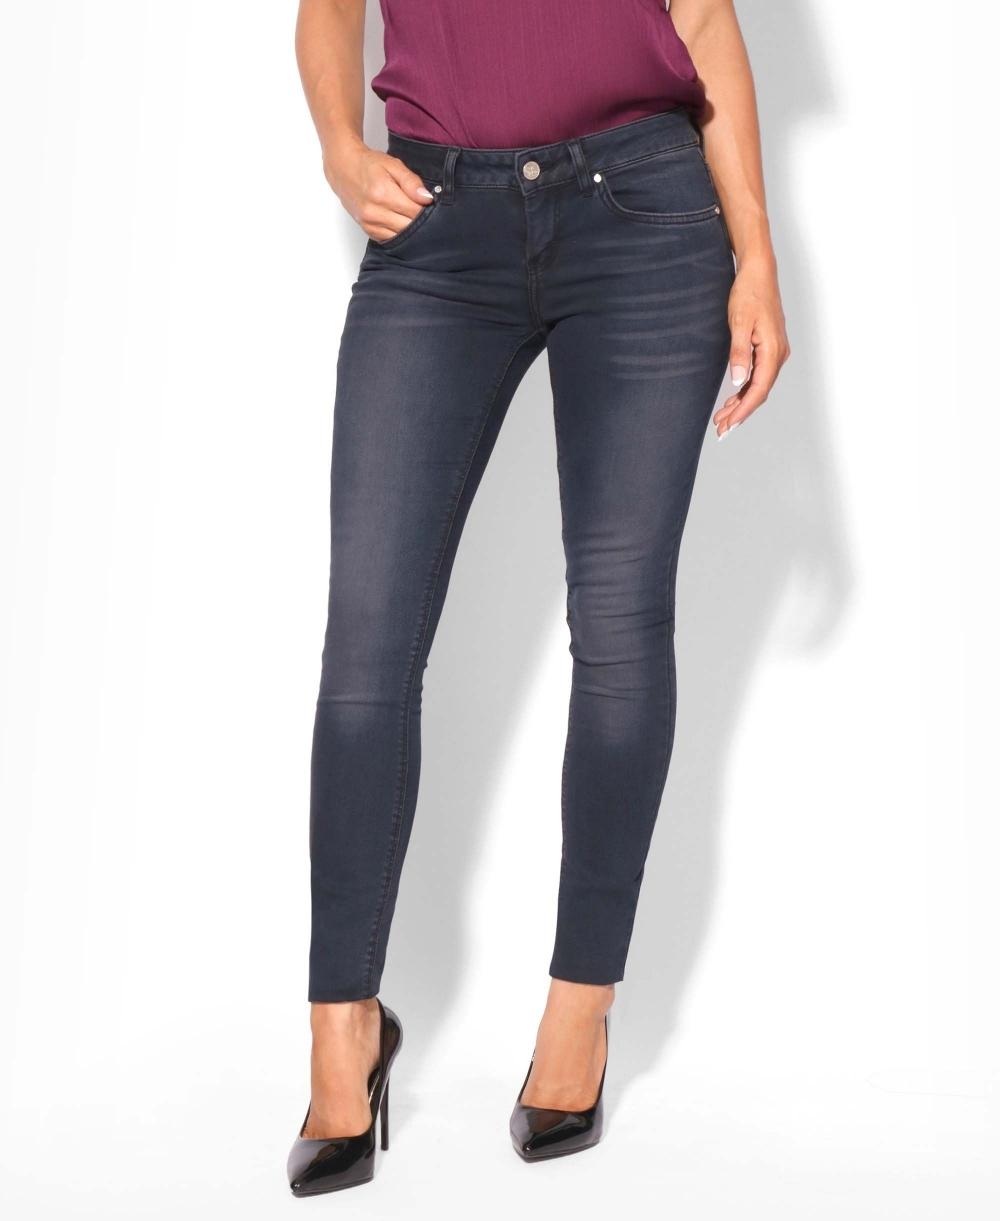 0c86a09f78c4 Acid Dark Wash Skinny Jeans